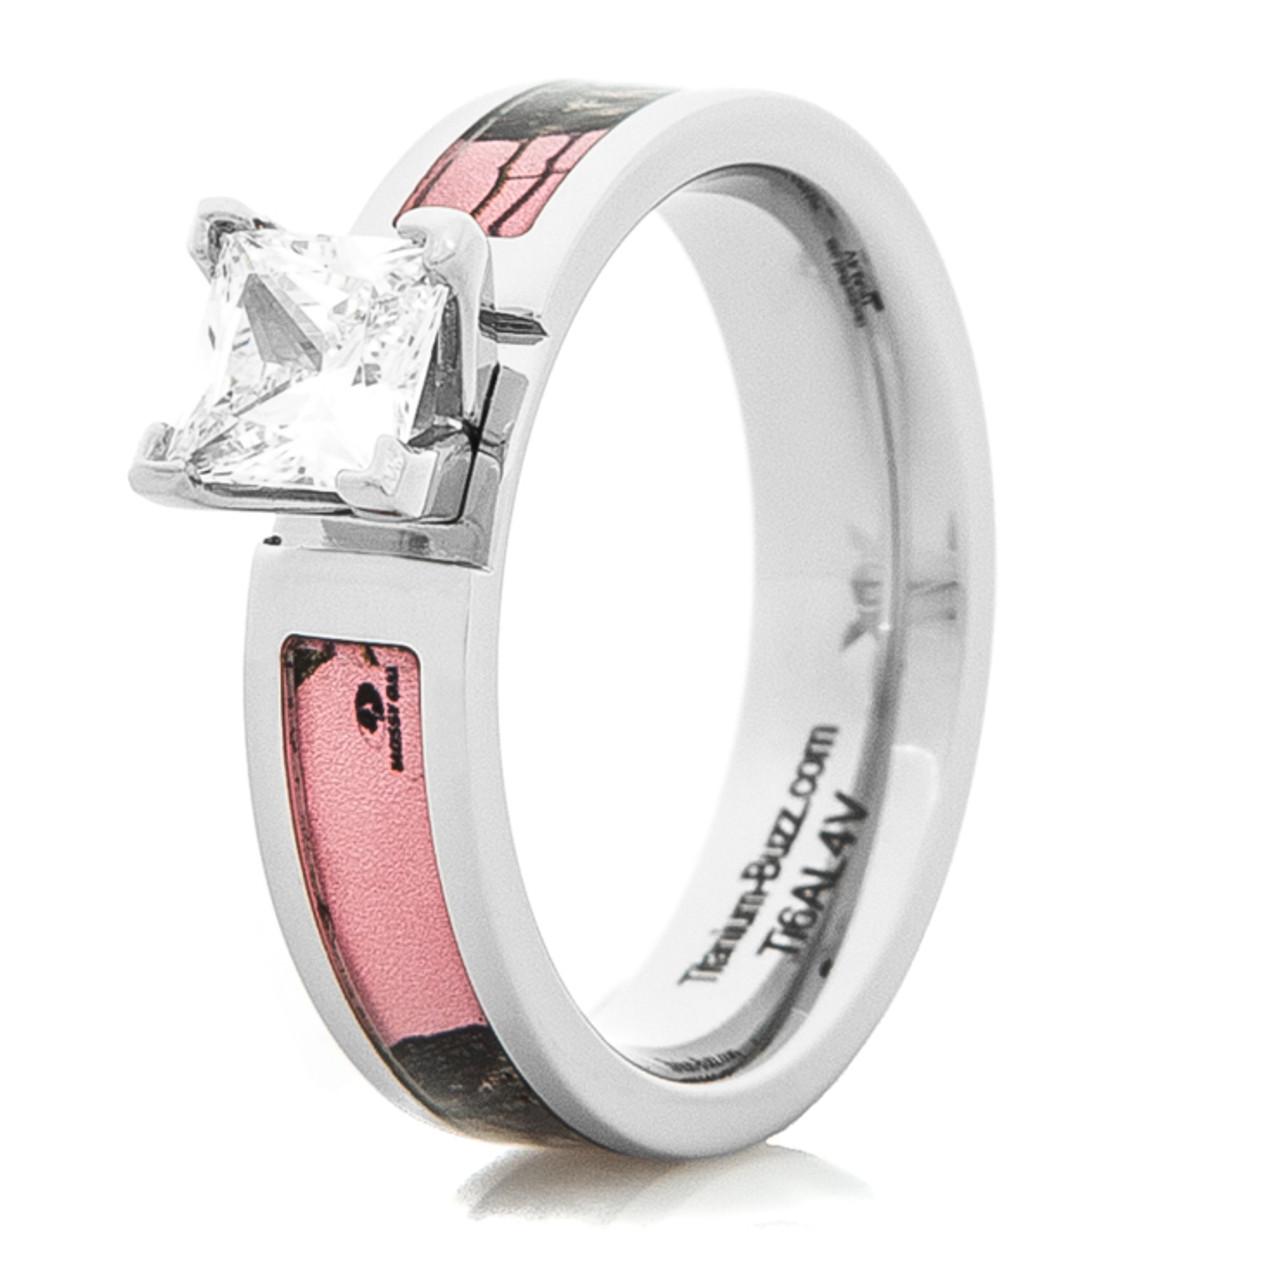 dbae4127a Cobalt Chrome Pink Mossy Oak Diamond Ring - Titanium-Buzz